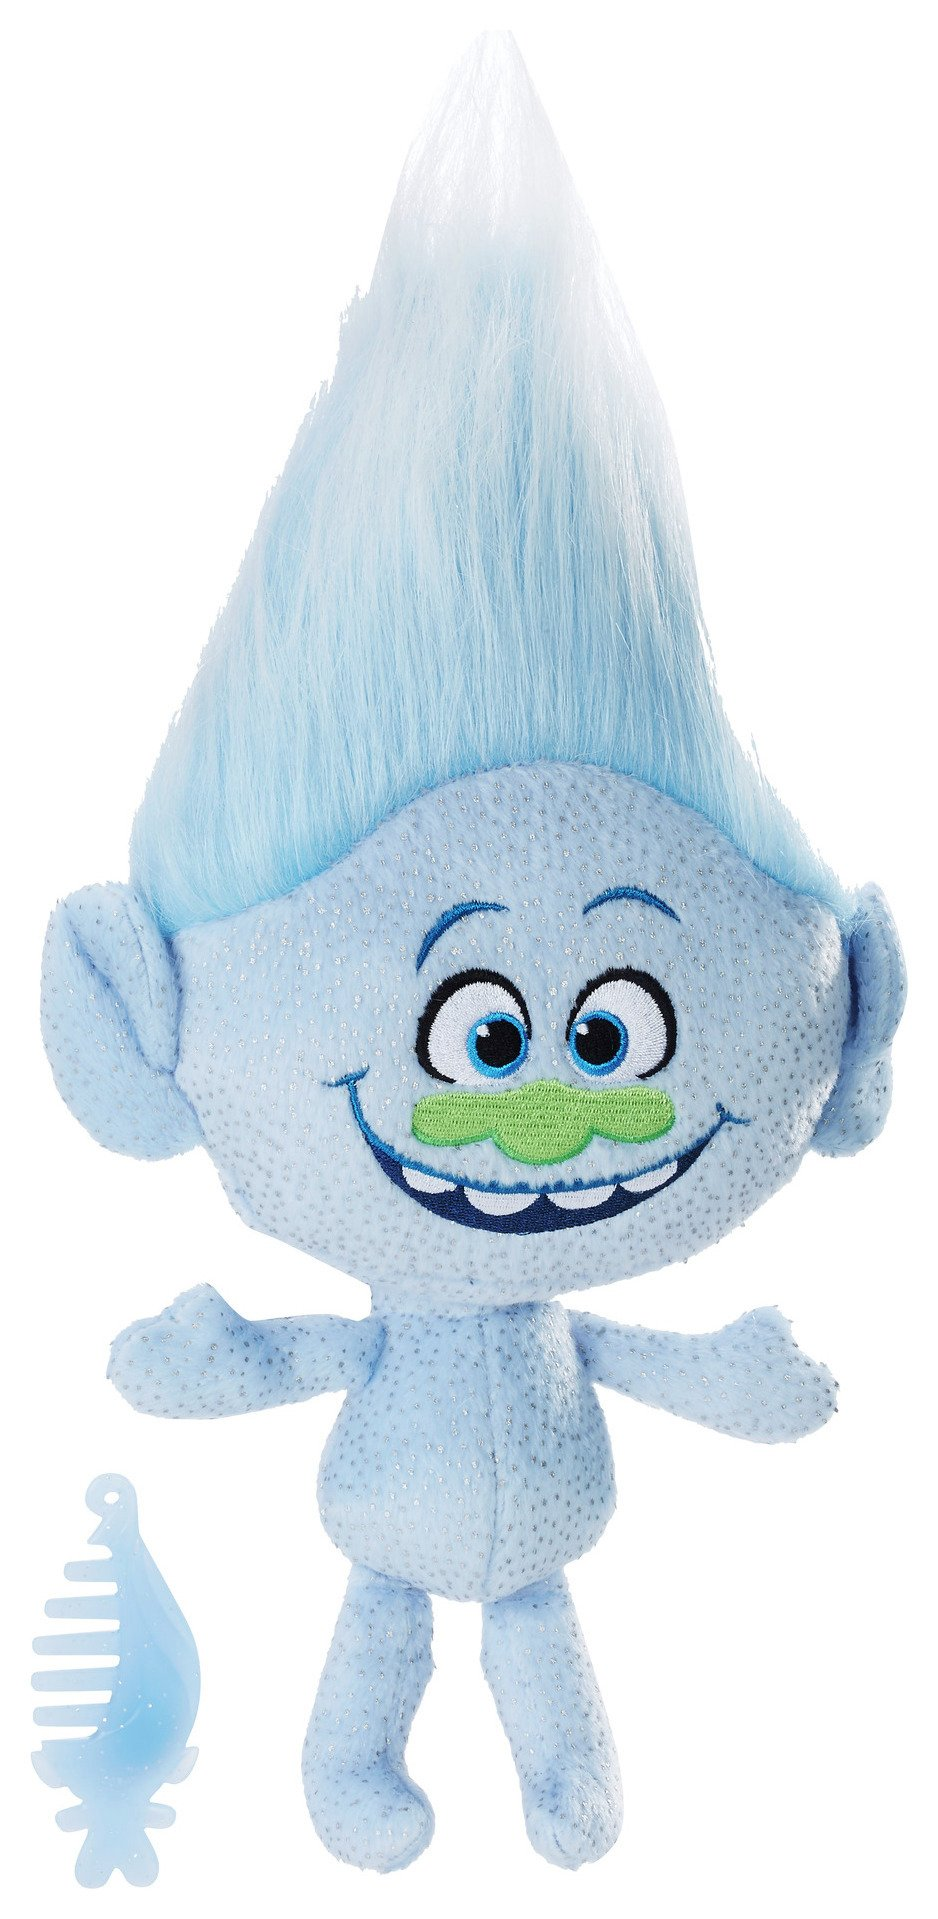 DreamWorks Trolls Guy Diamond Talkin' Troll Plush Doll